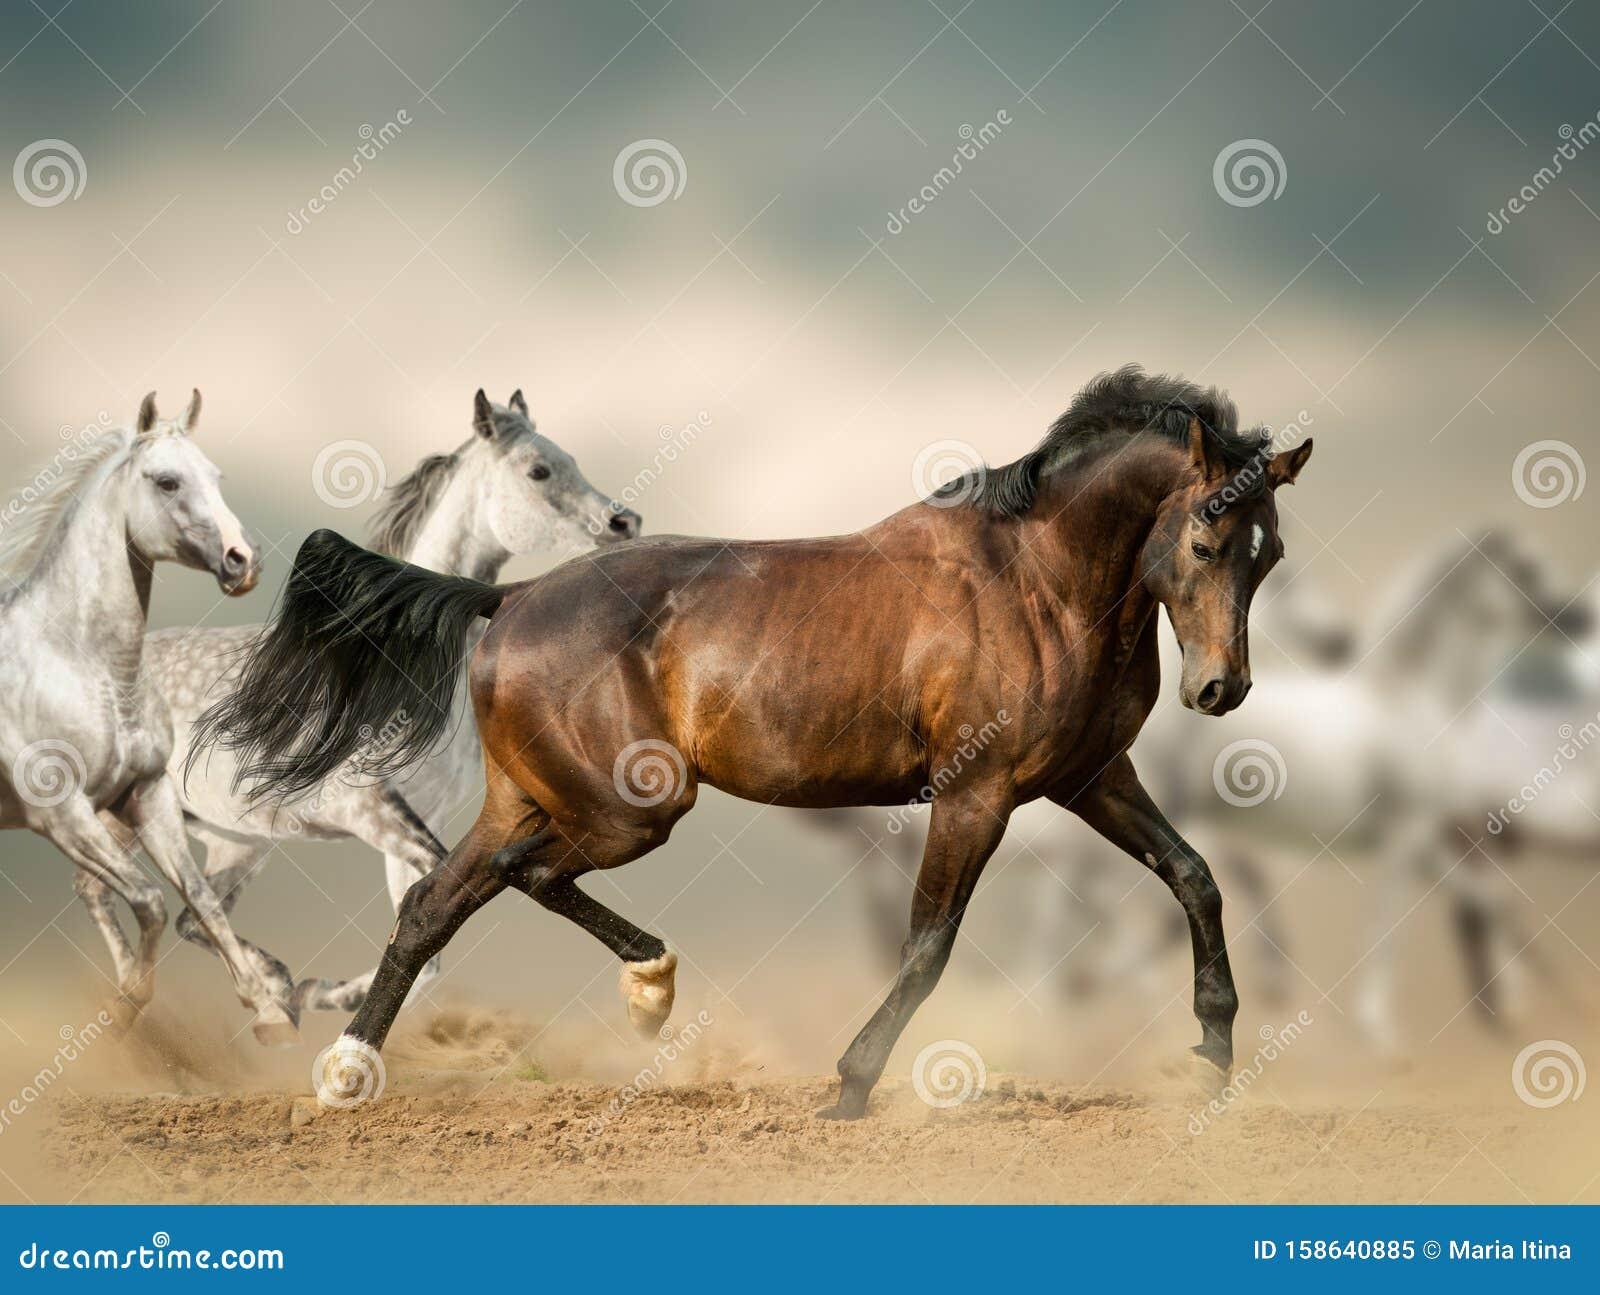 Beautiful Wild Horses In Desert Stock Image Image Of Motion Activity 158640885